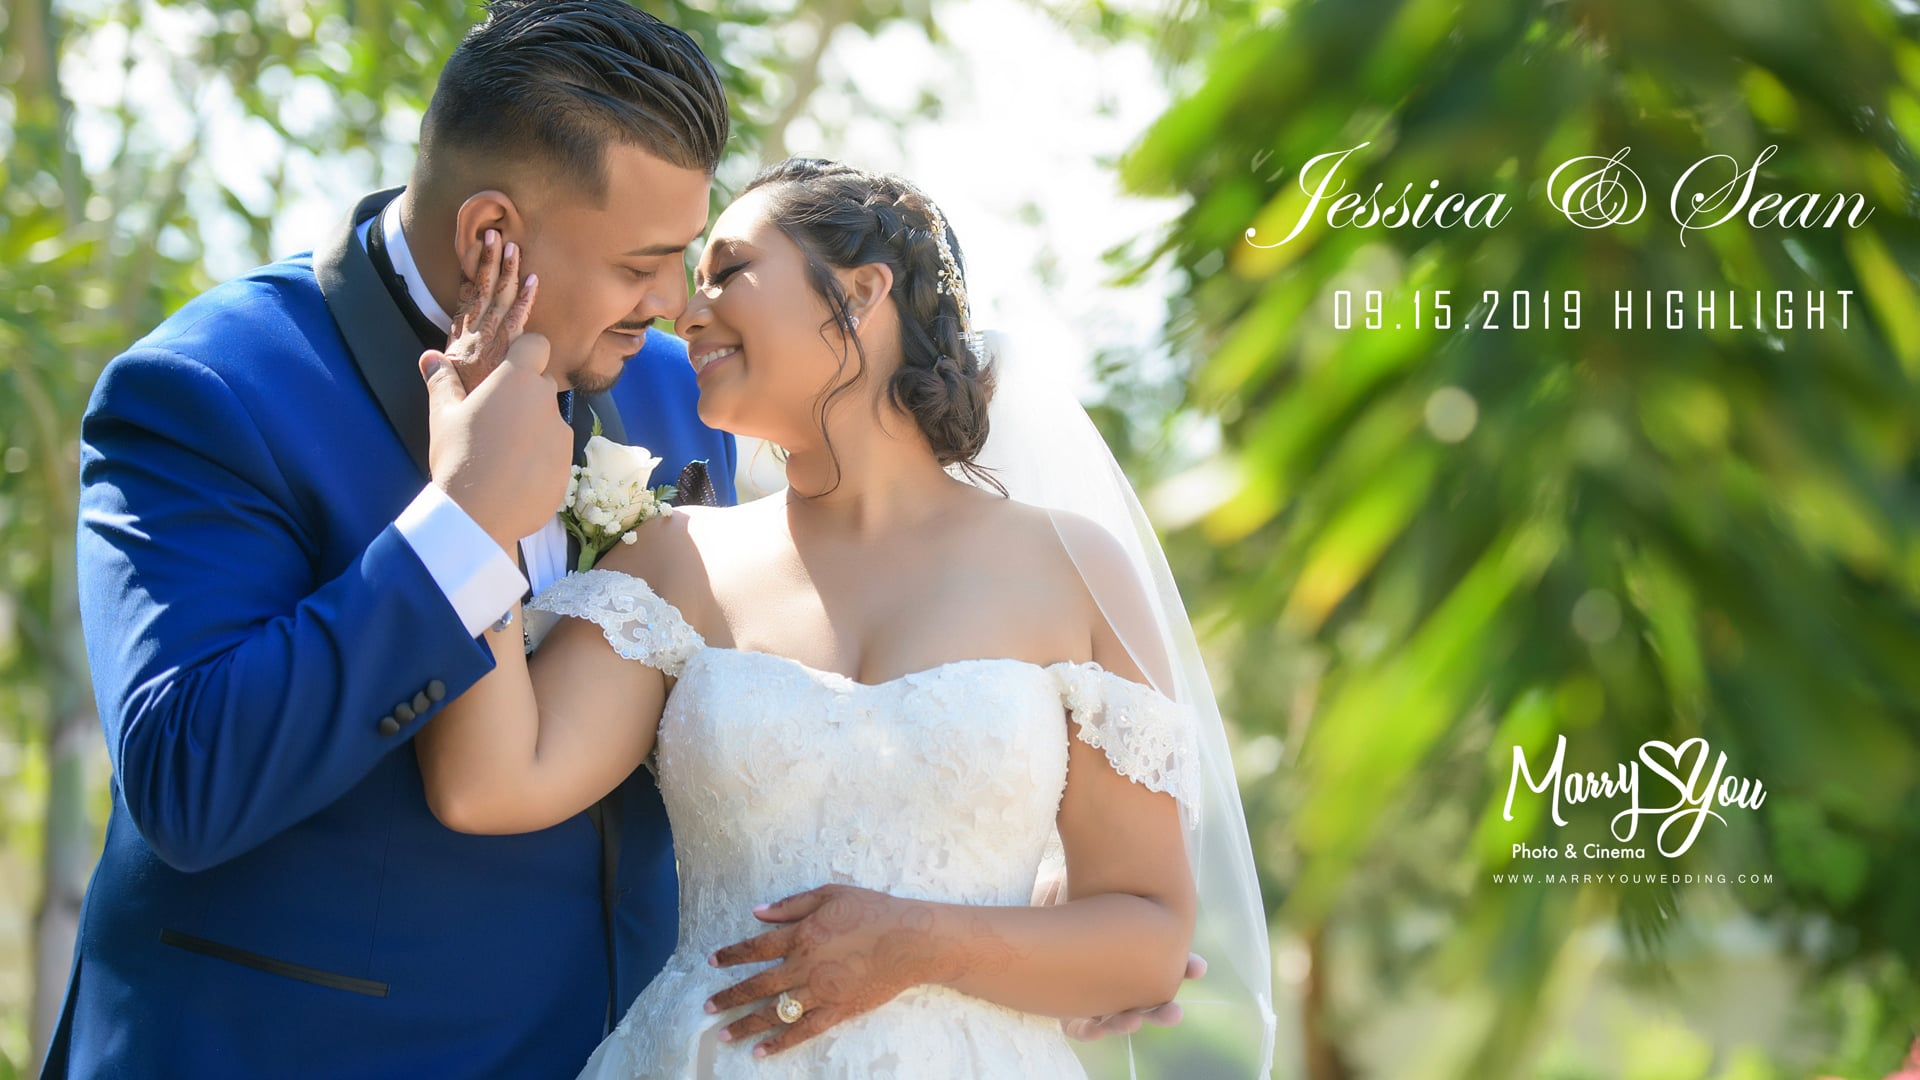 Jessica & Sean wedding highlight